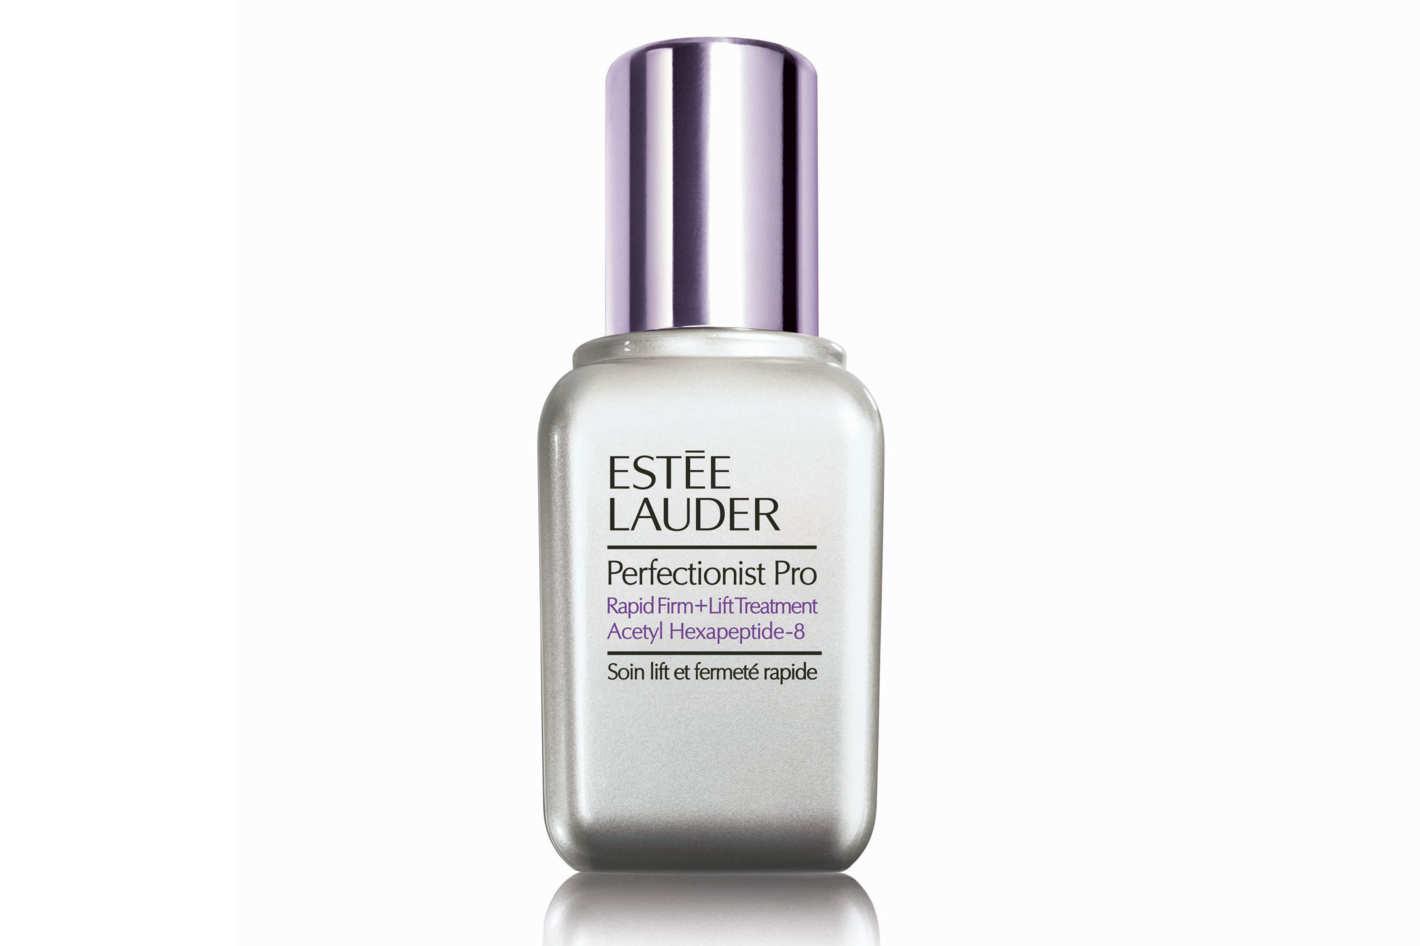 Tinh chất serum săn chắc trẻ hóa da Estee Lauder Perfectionist Pro 50ML